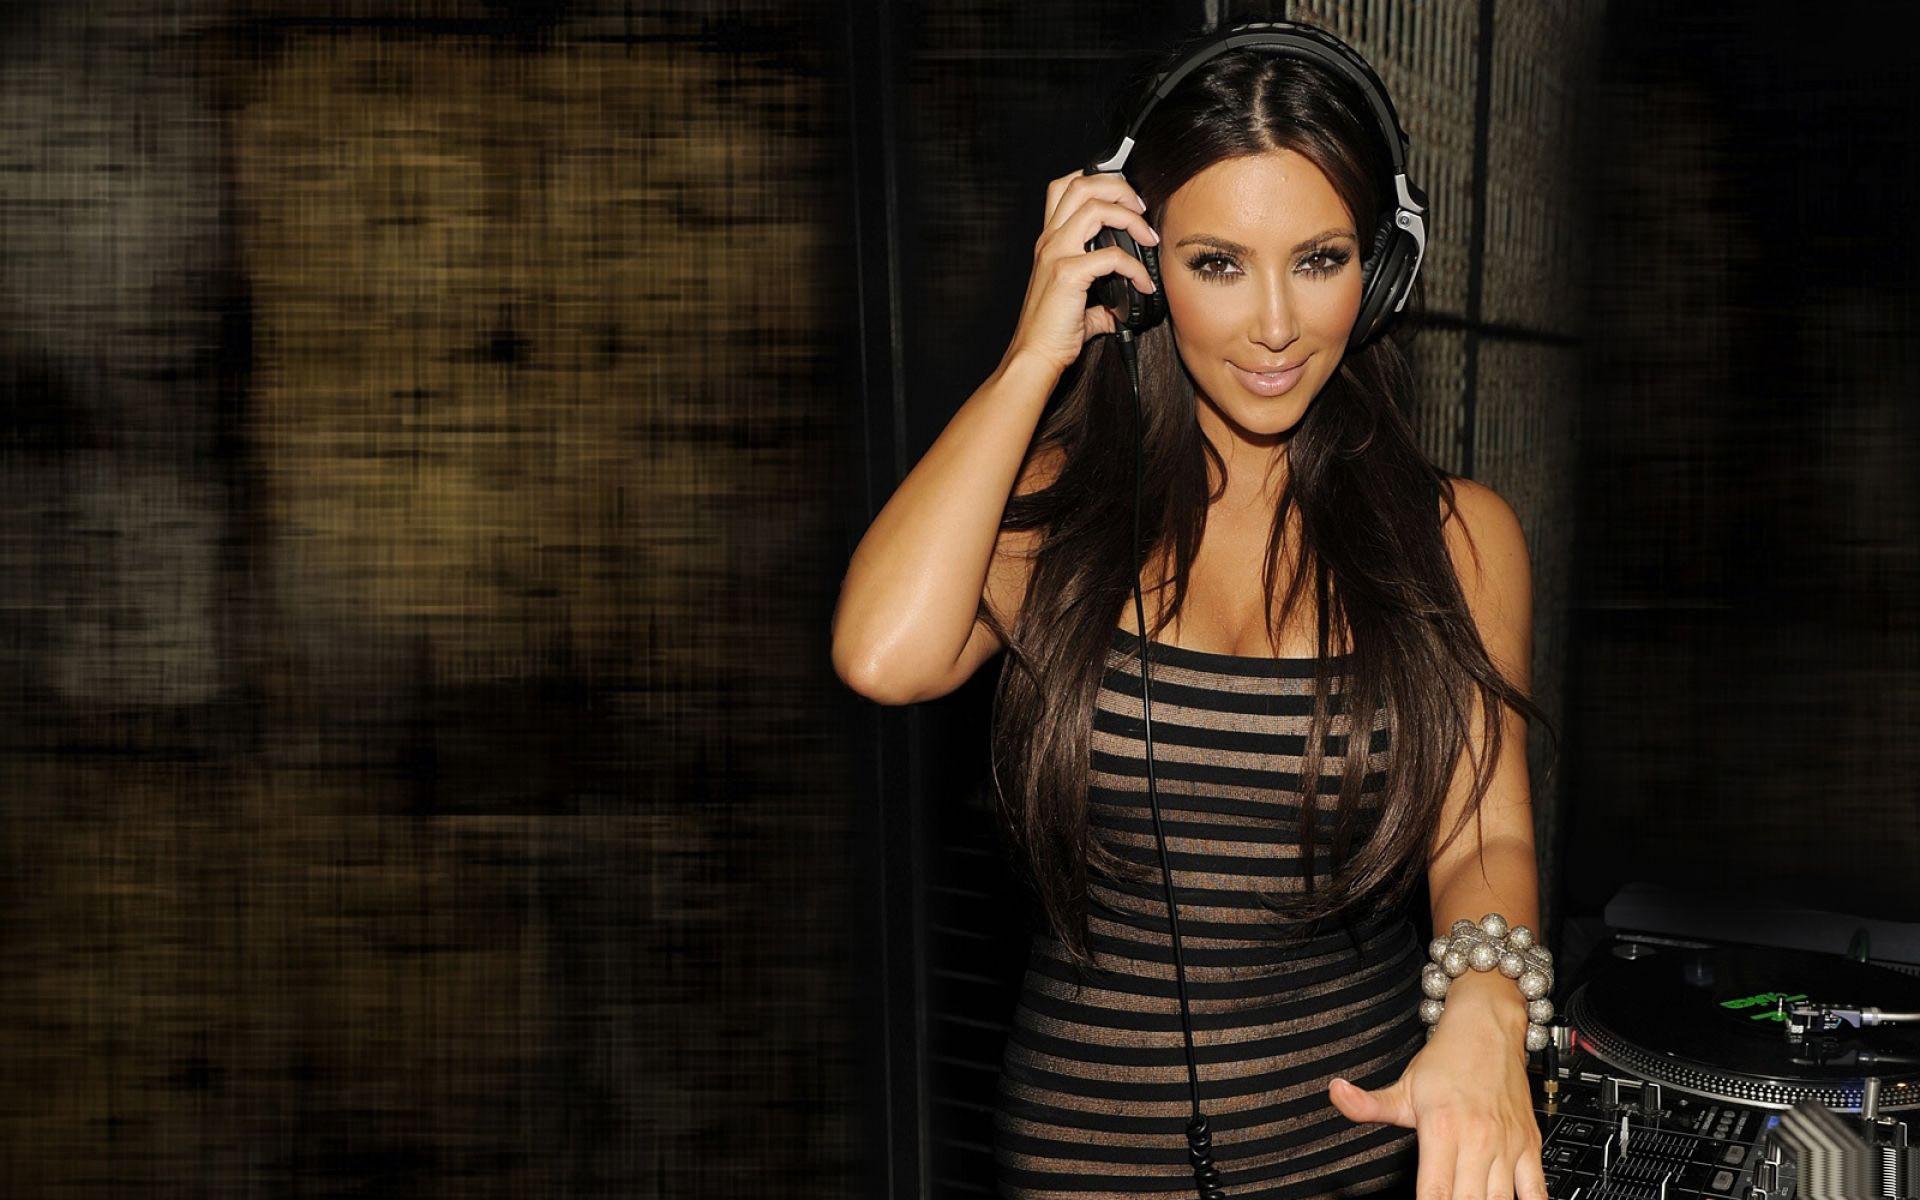 Kim Kardashian Hot 2013 HD Wallpaper of Celebrities 1920x1200